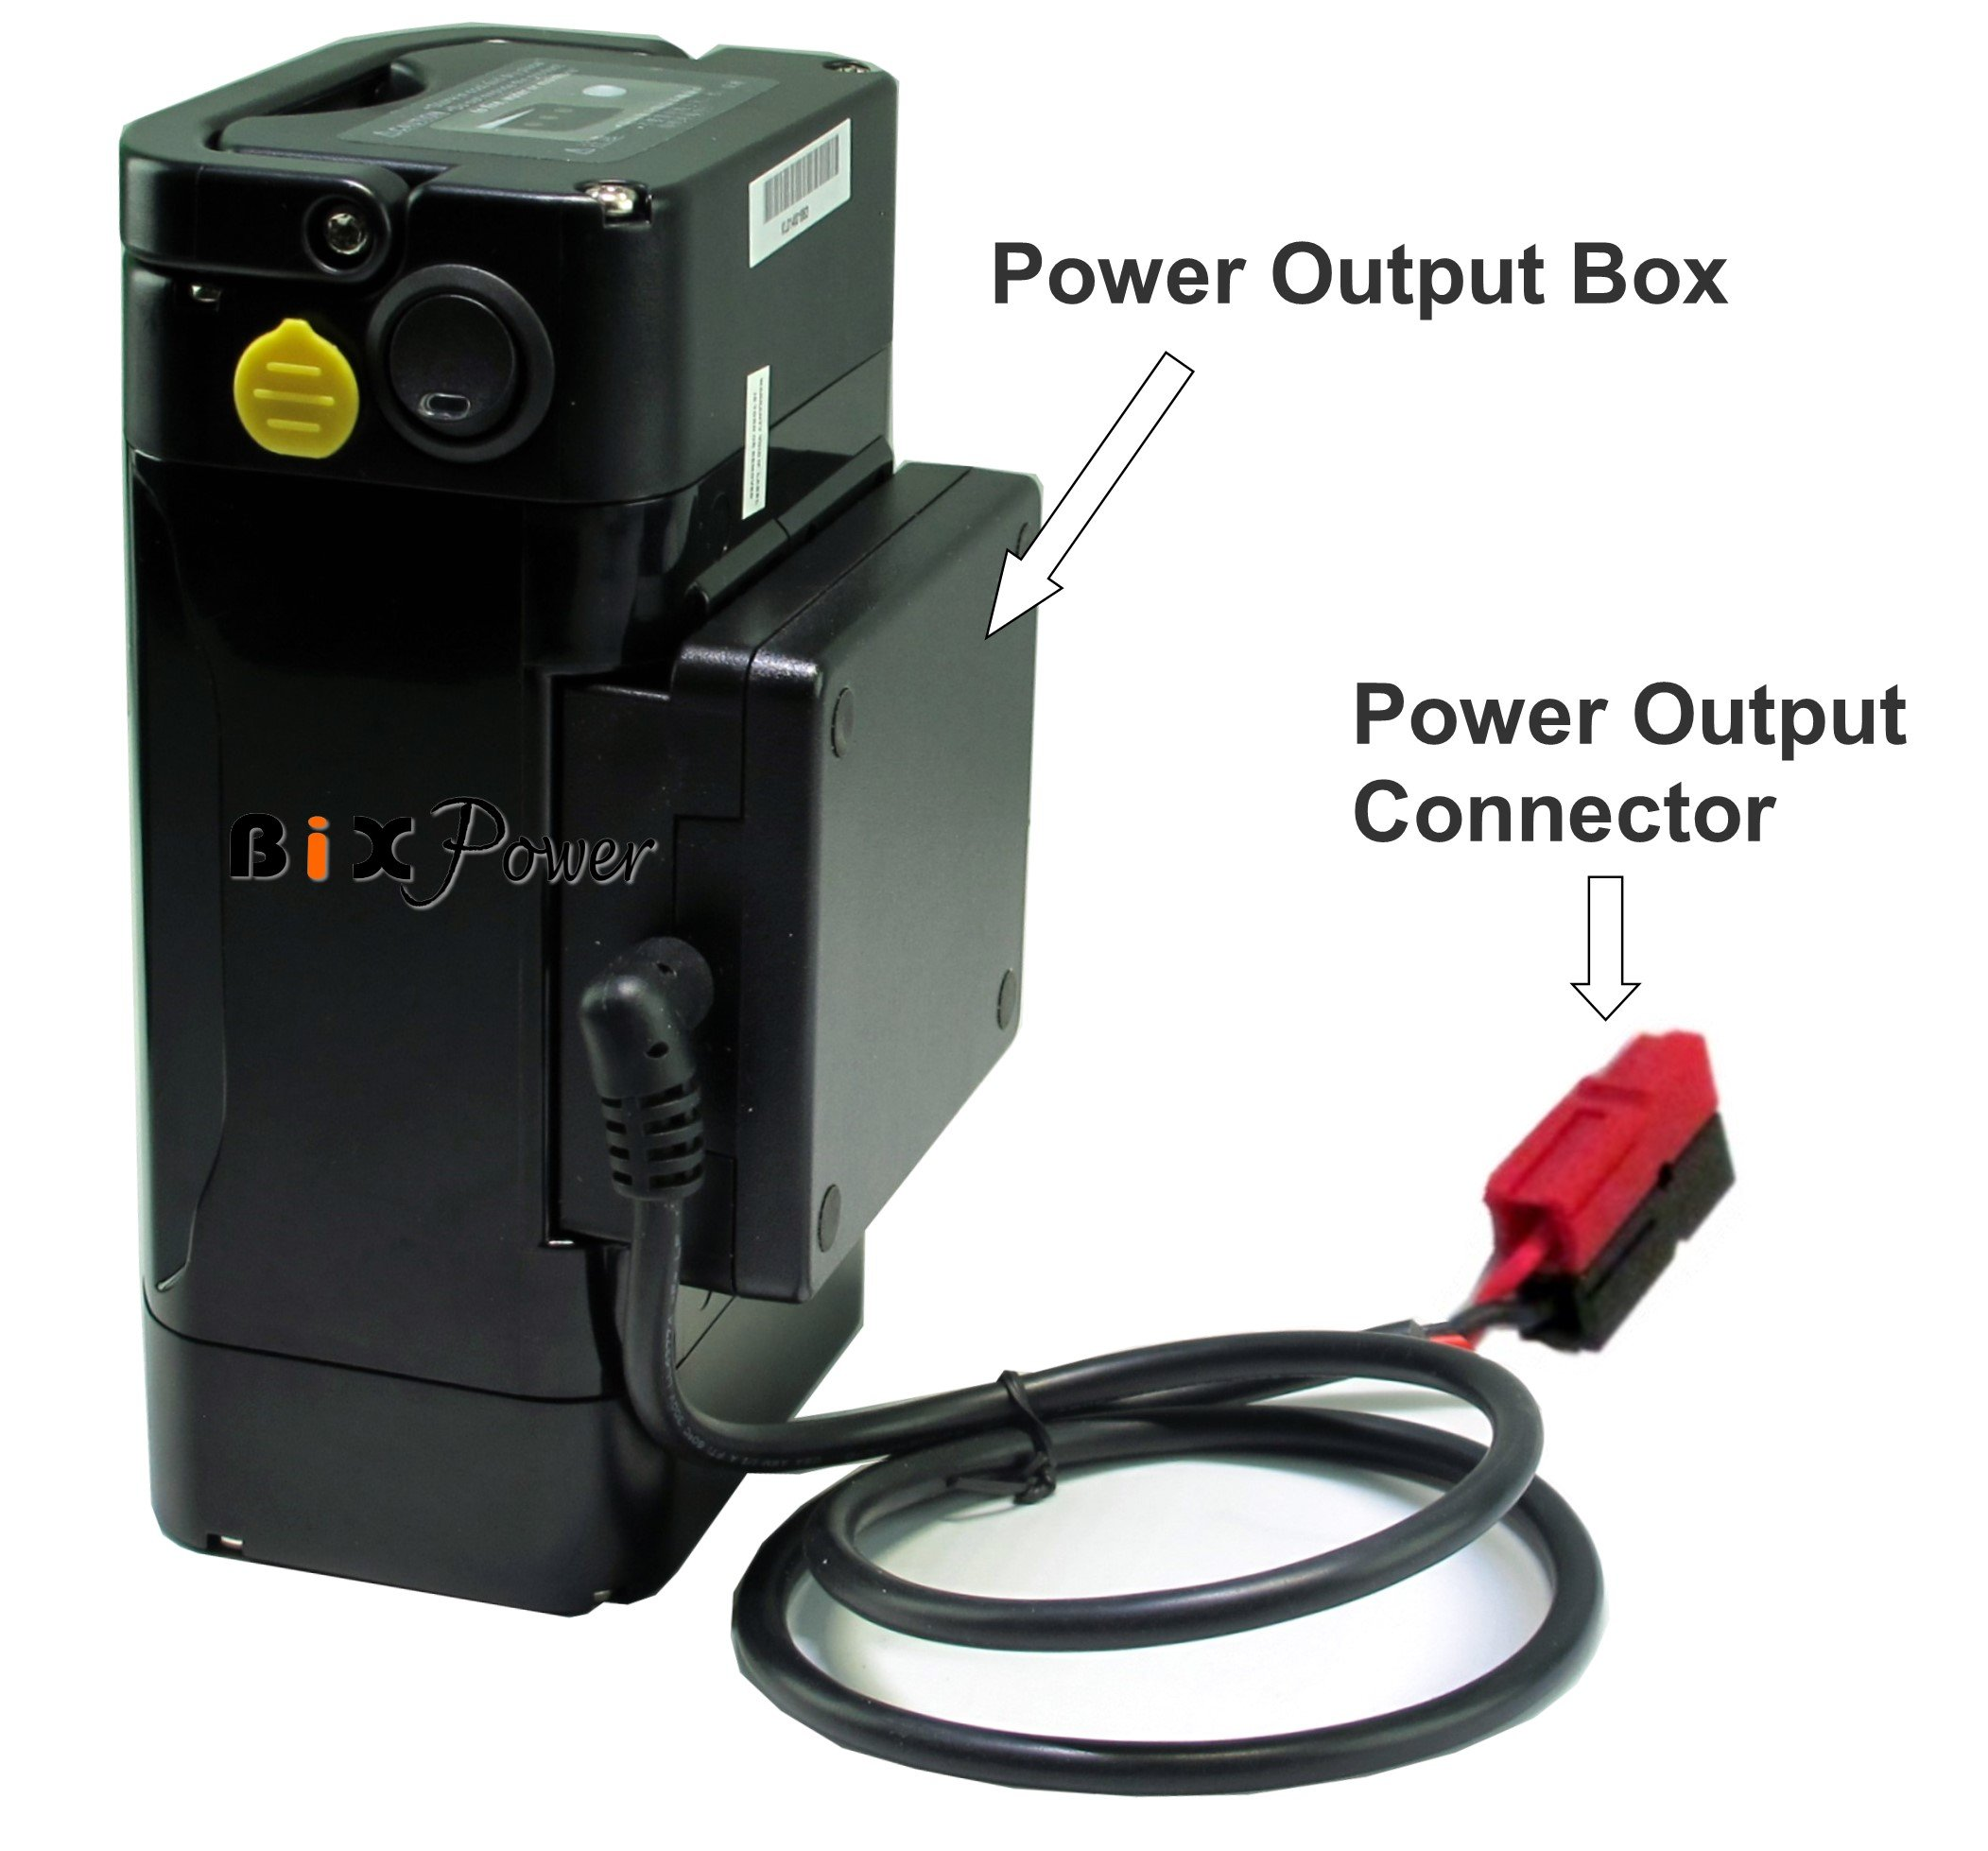 BiXPower MP330DC Battery Pack - Super Capacity 336 Watt-hour Light Weight Battery with Multi Output Voltages (12v/15v/16v/18v/19v/24v) Power Converter Combo Kit by BiXPower (Image #2)